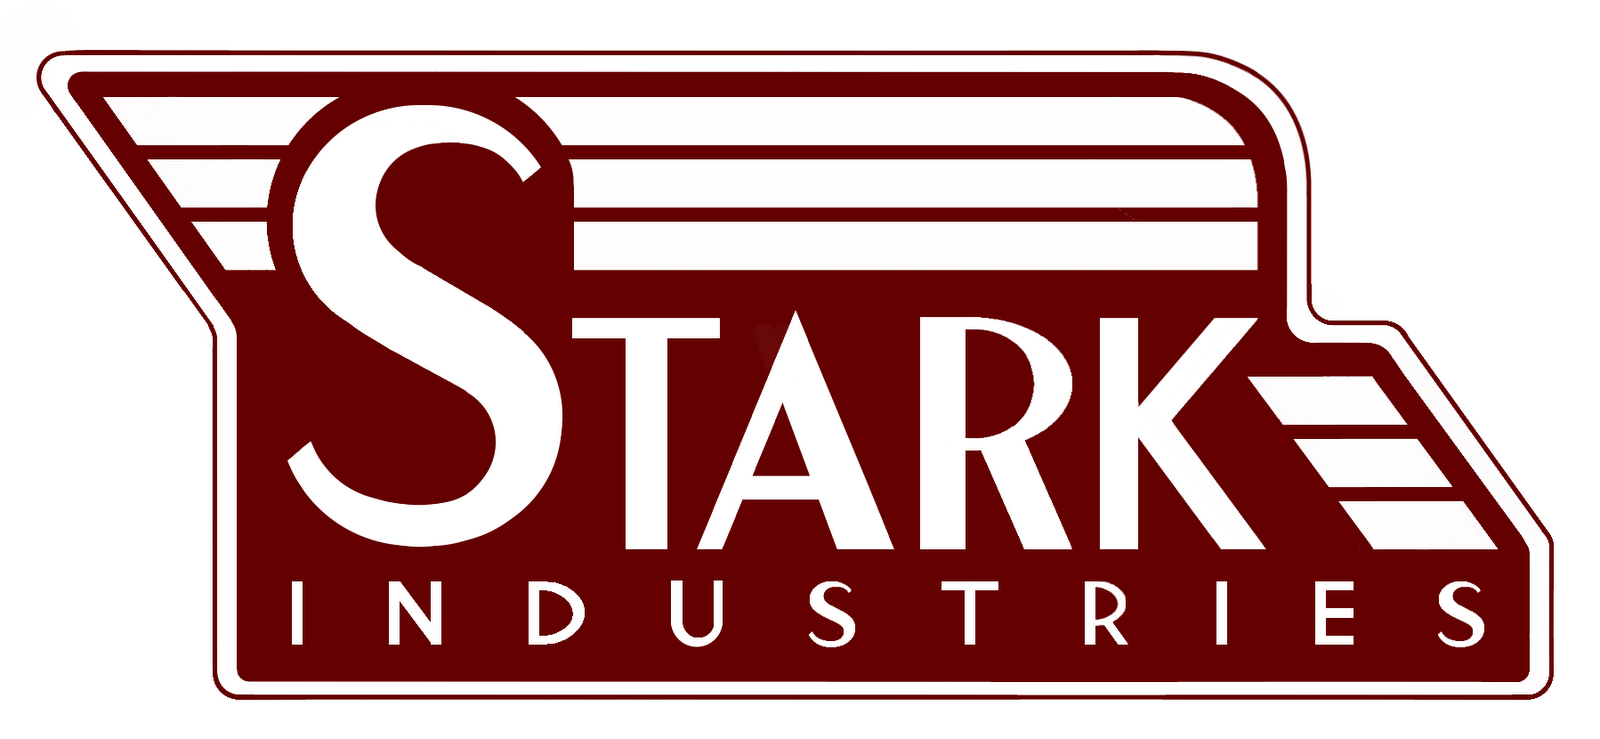 Hd wallpaper iron man - Stark Industries Viewing Gallery